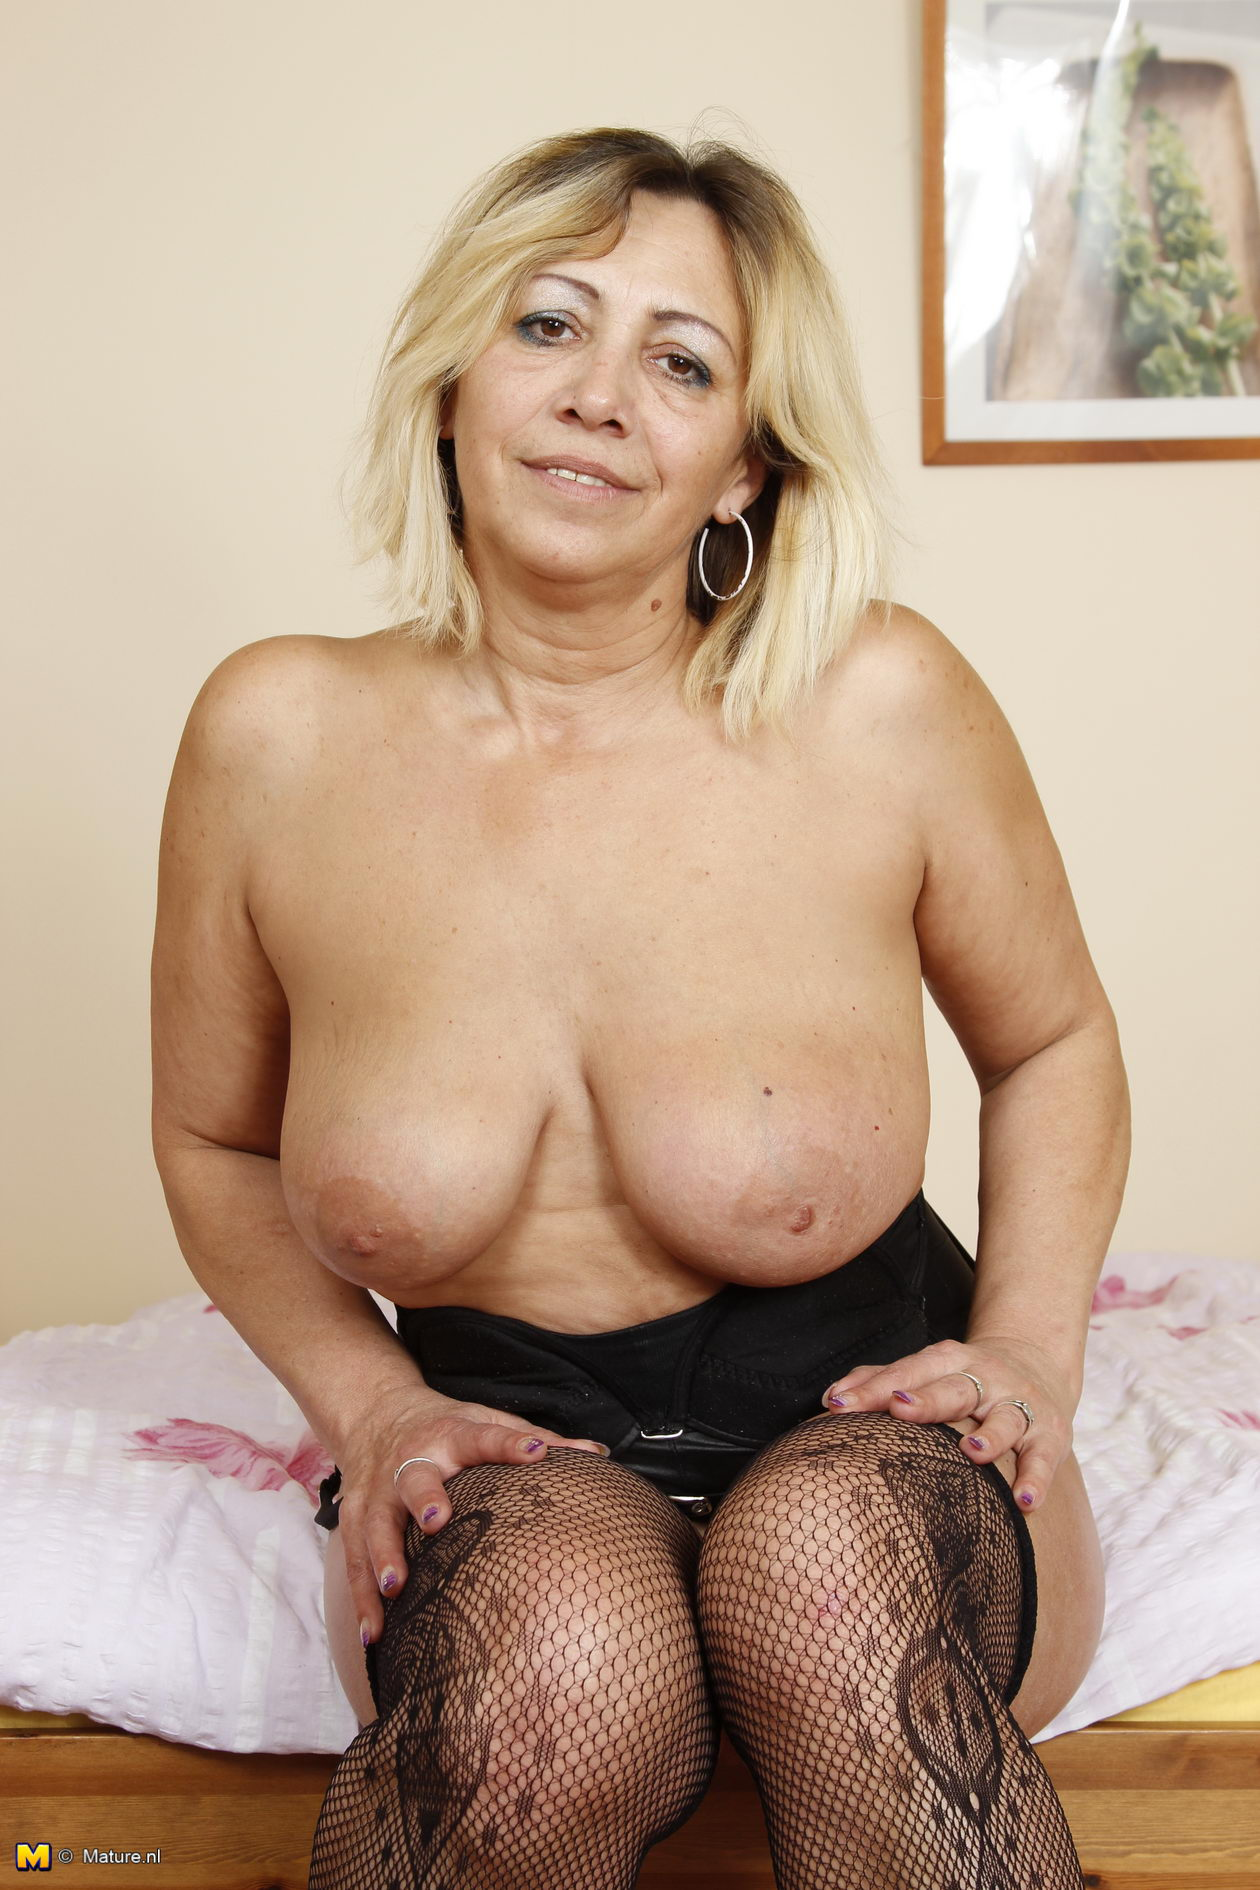 Art erotic figure older woman